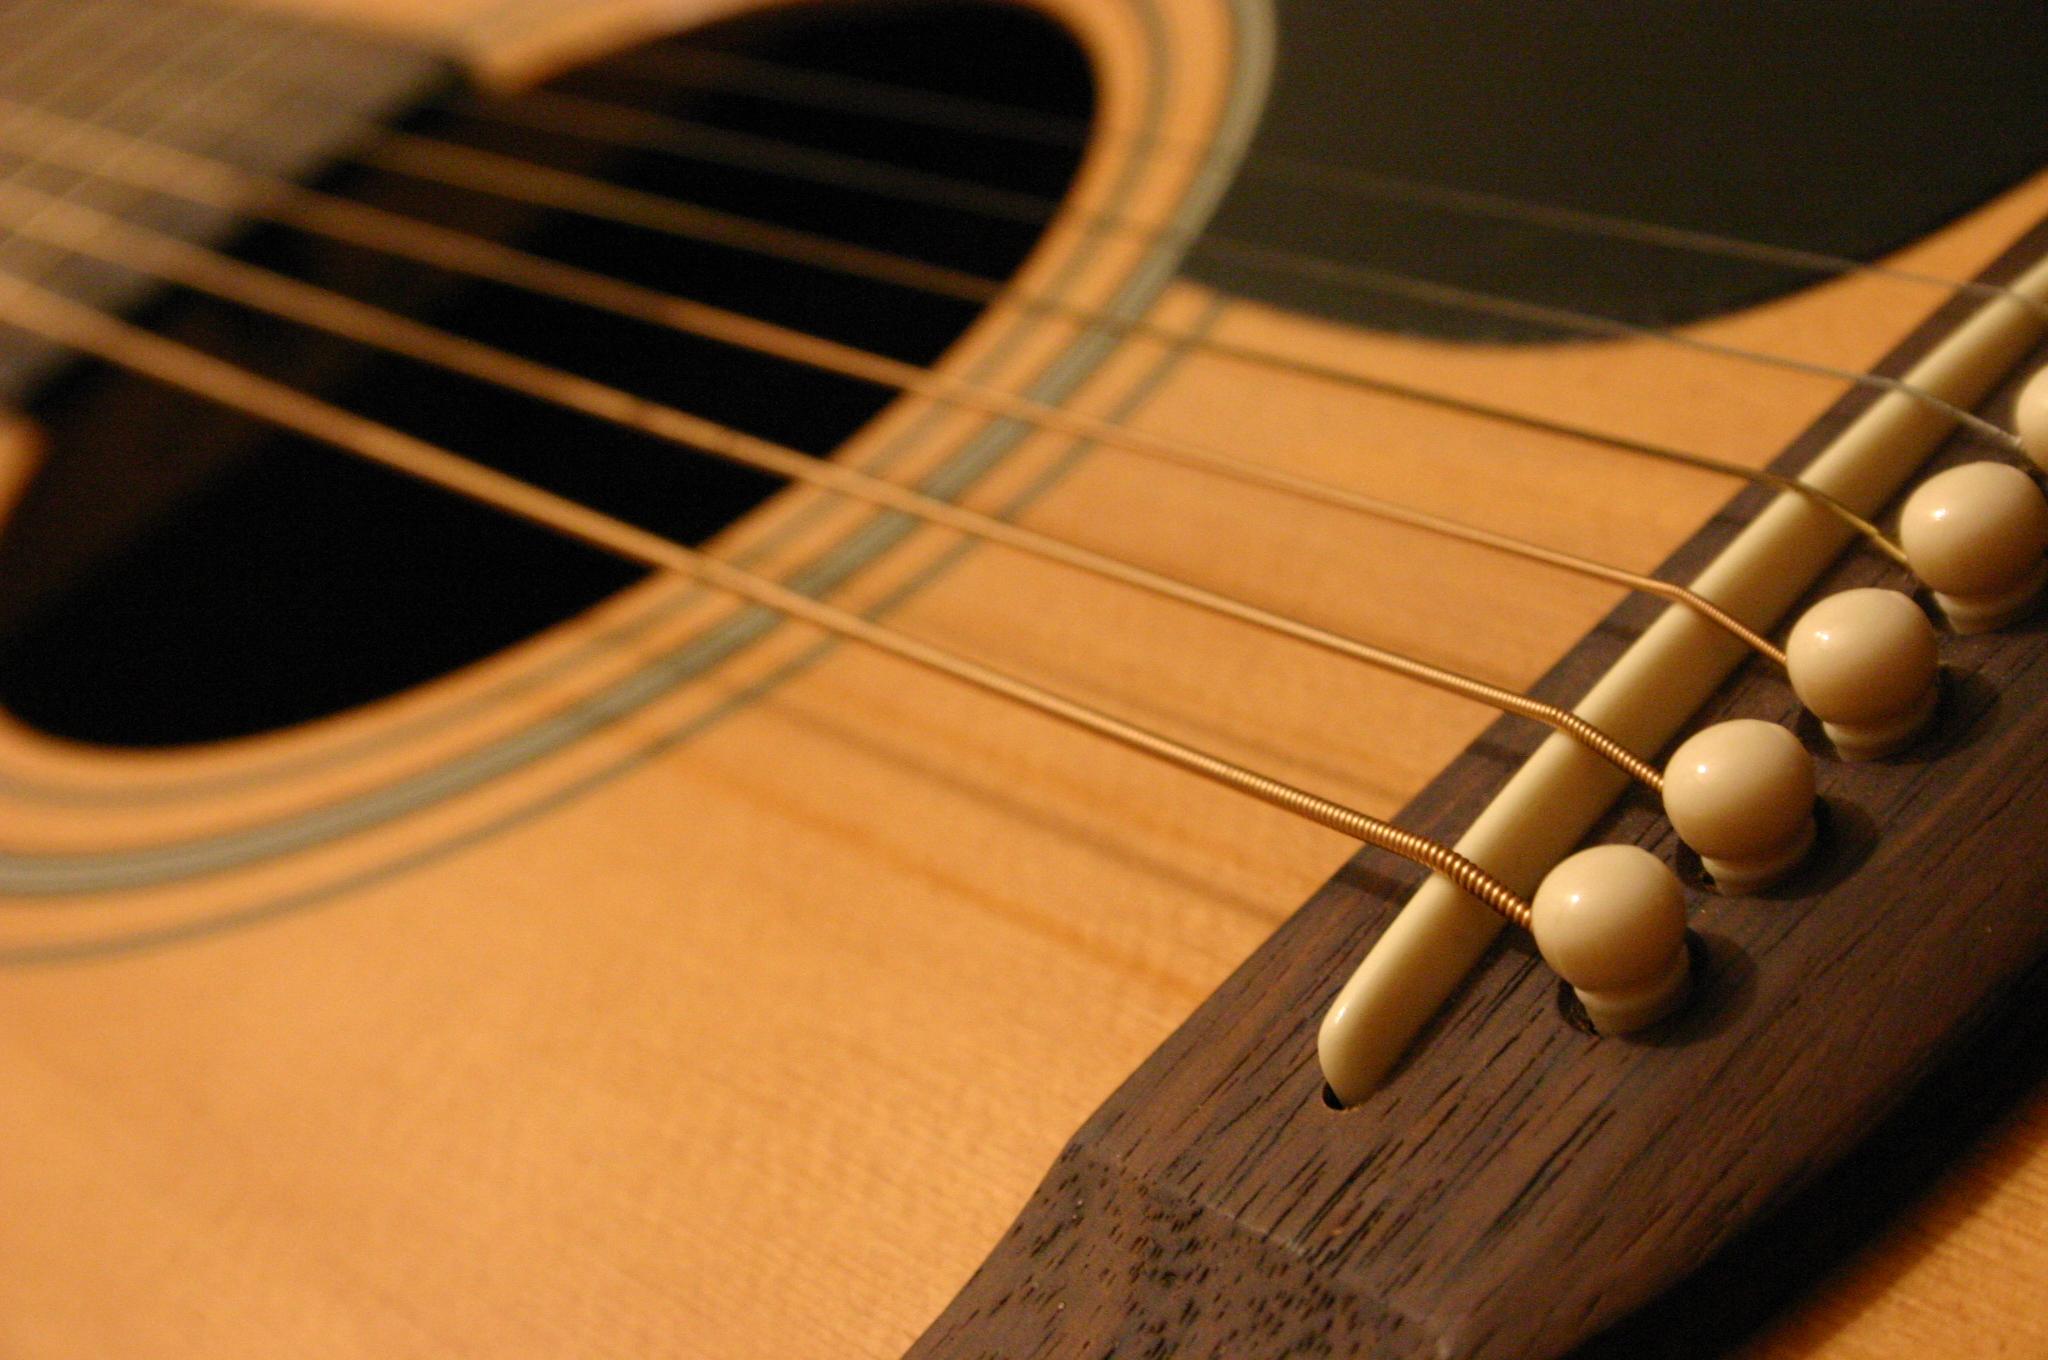 Guitar, Bspo06, Music, Musicalinstrumen, Strings, HQ Photo